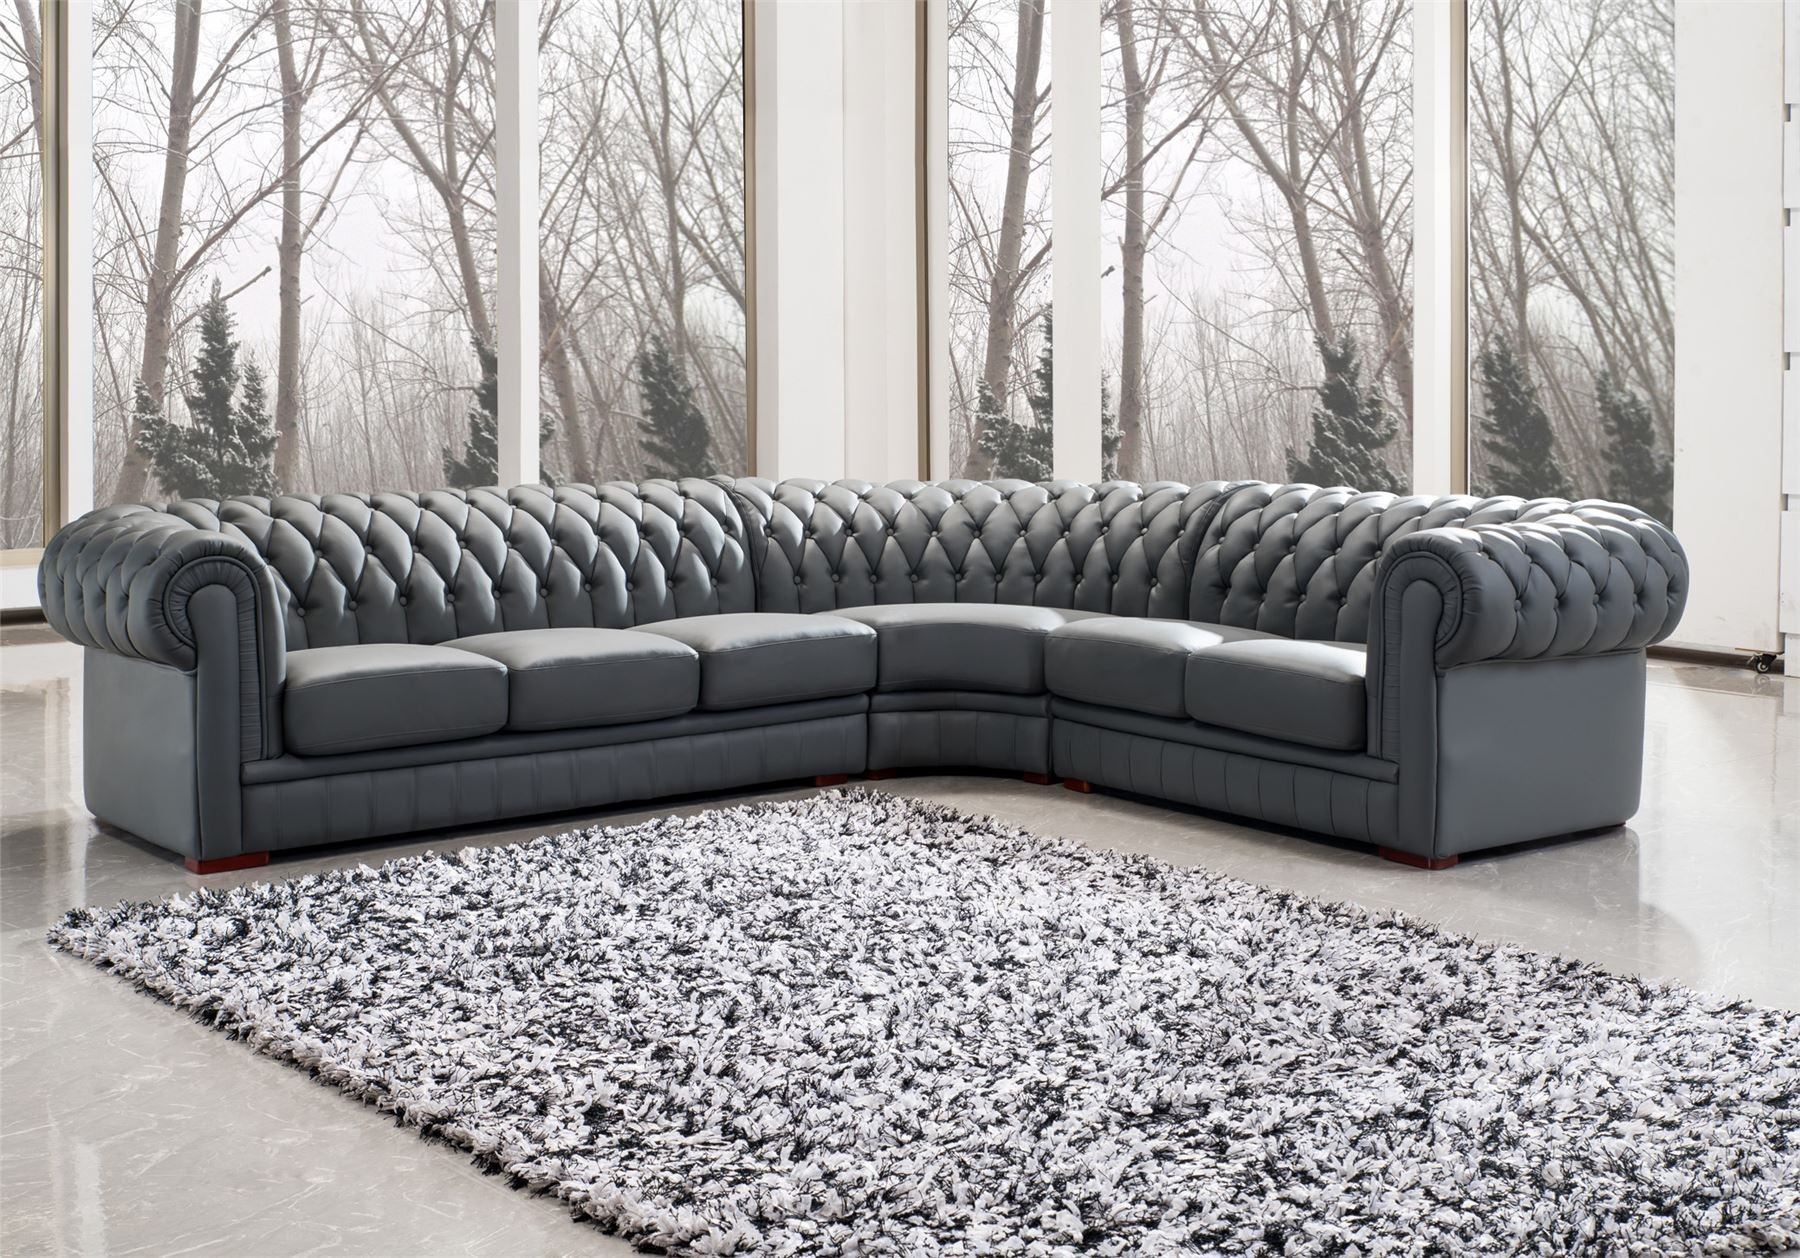 crate and barrel sleeper sofa sofas birmingham bespoke large corner | ideas